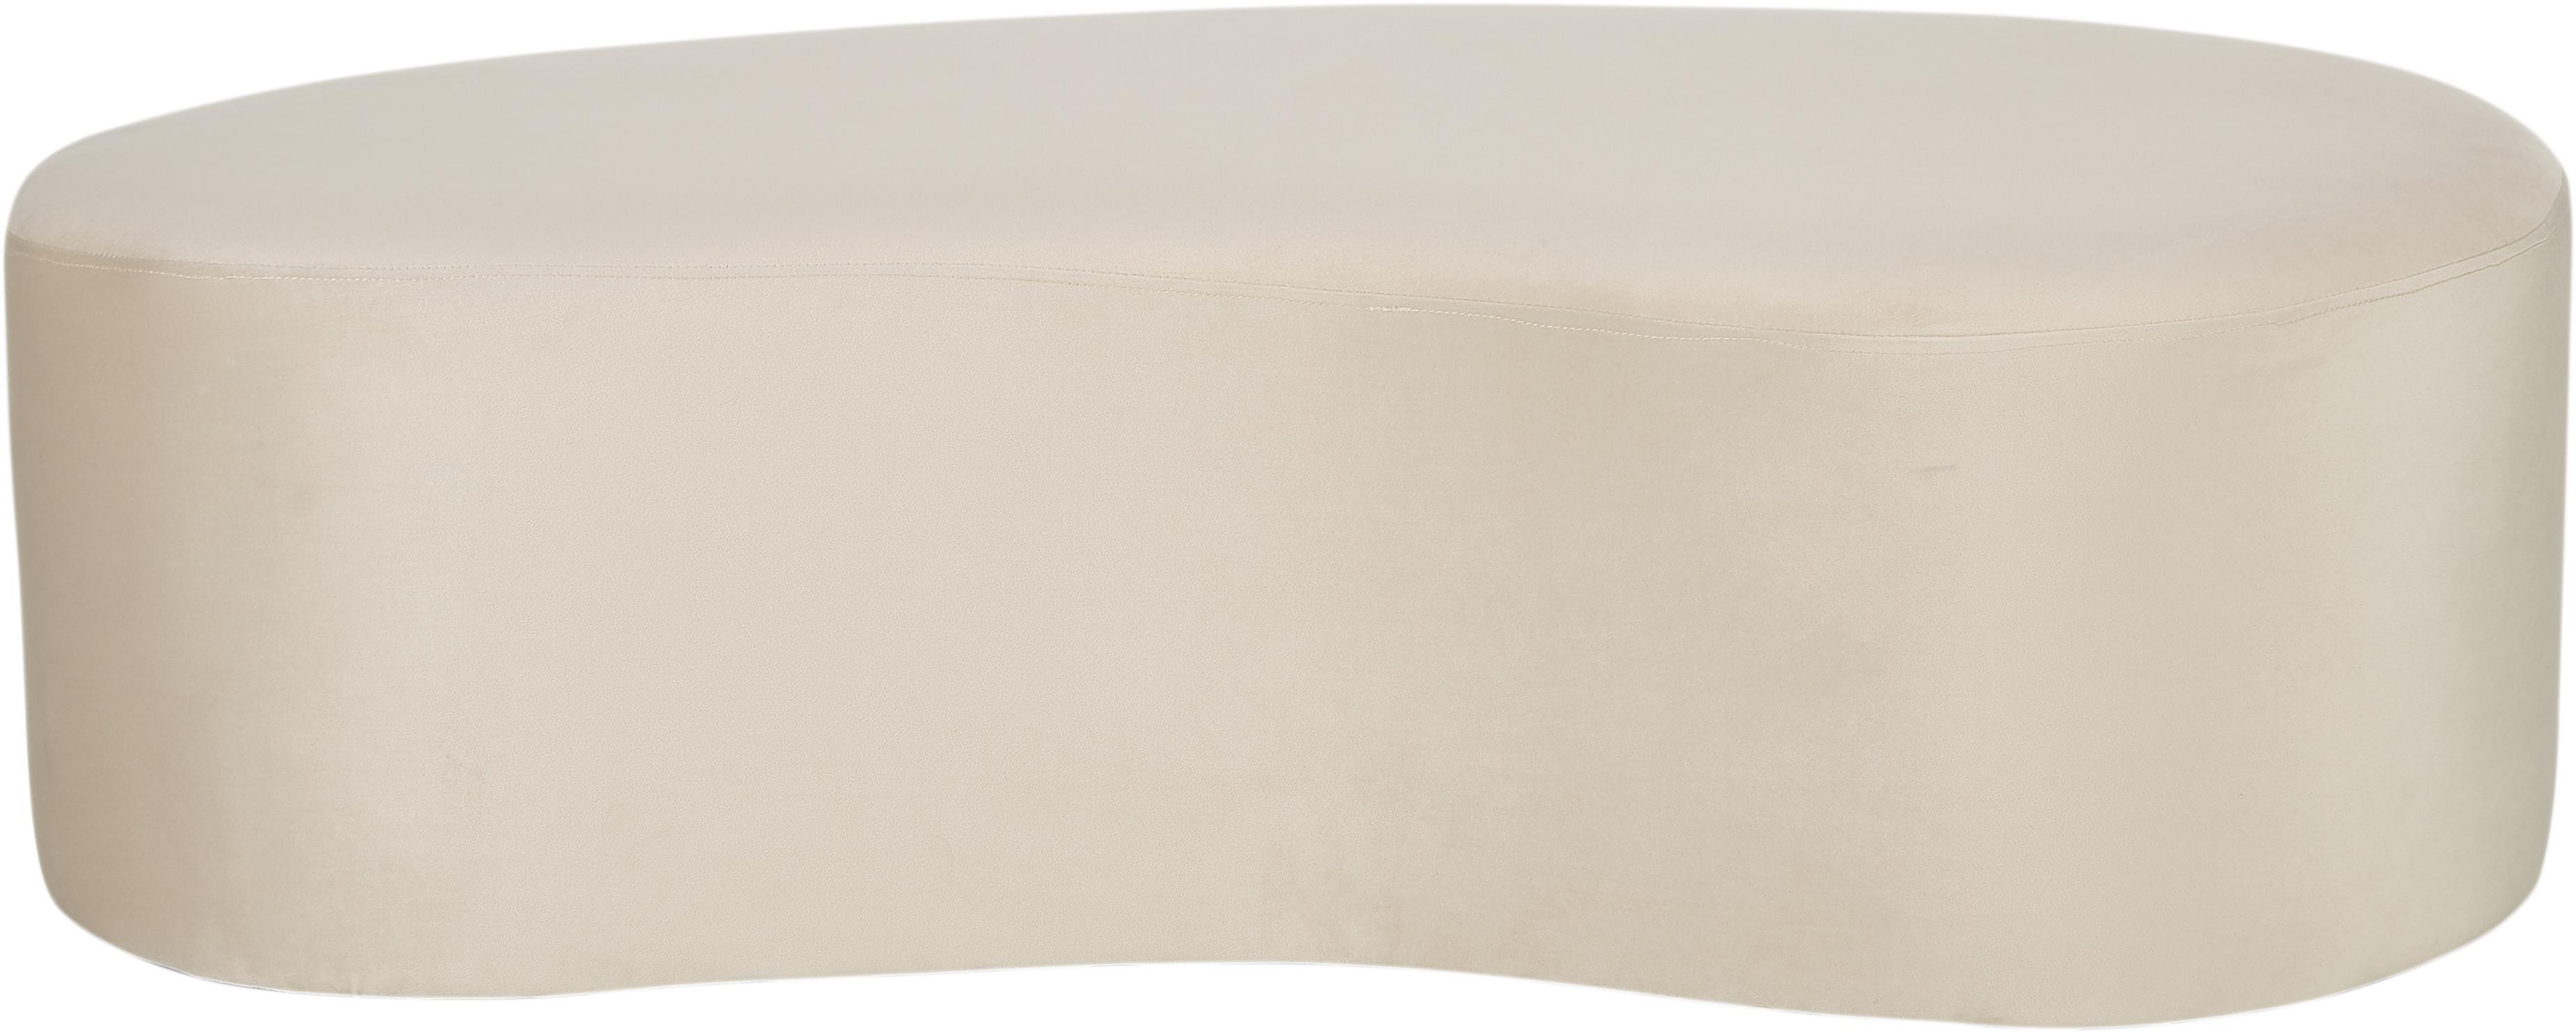 Pouf in velluto Horta, Poliestere, Bianco latteo, Larg. 60 x Alt. 36 cm